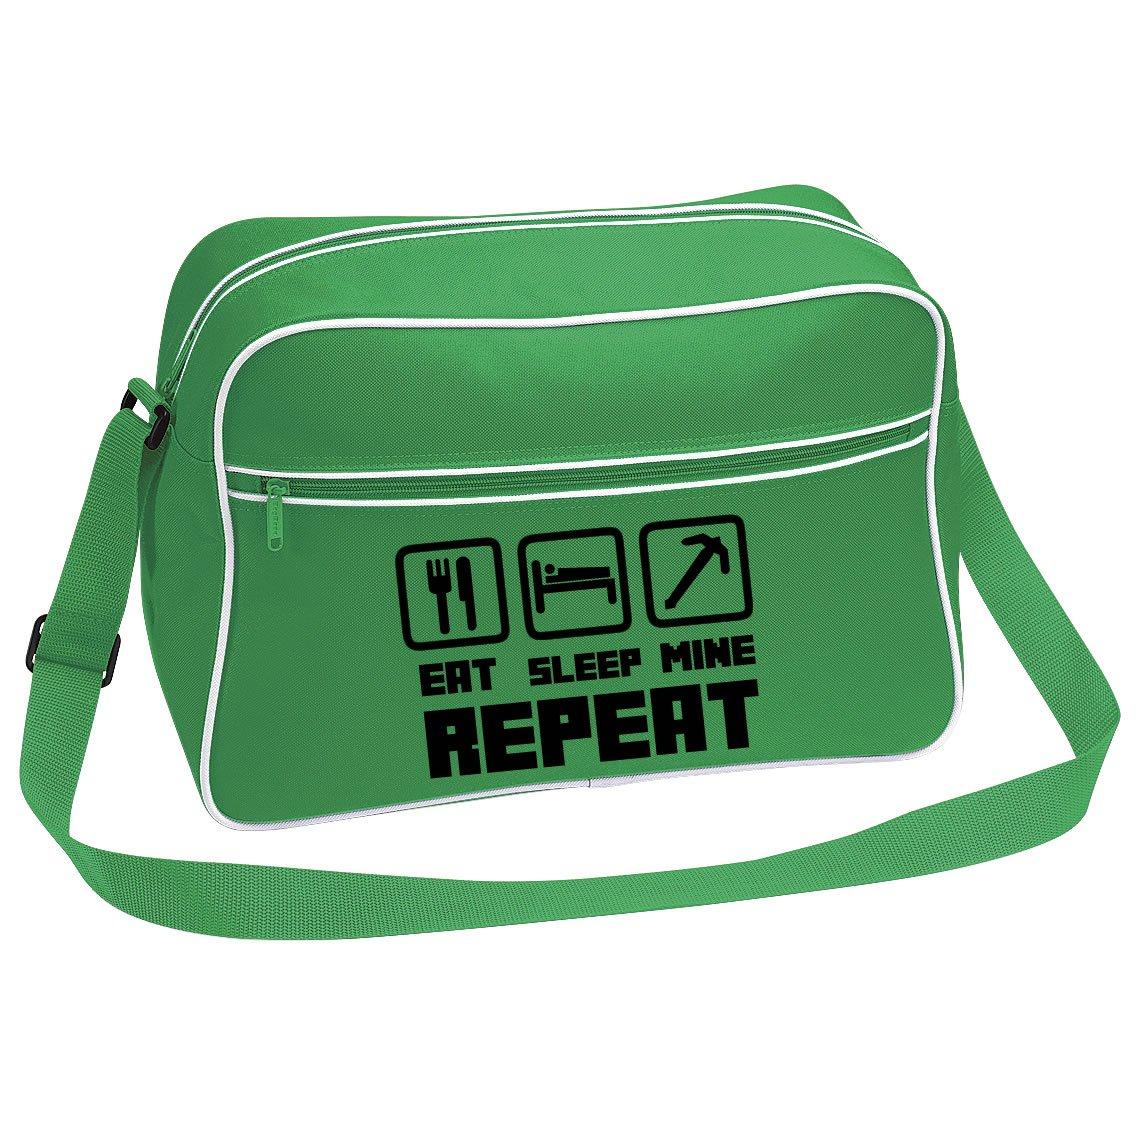 Retro Style Minecraft Shoulder Bag 10